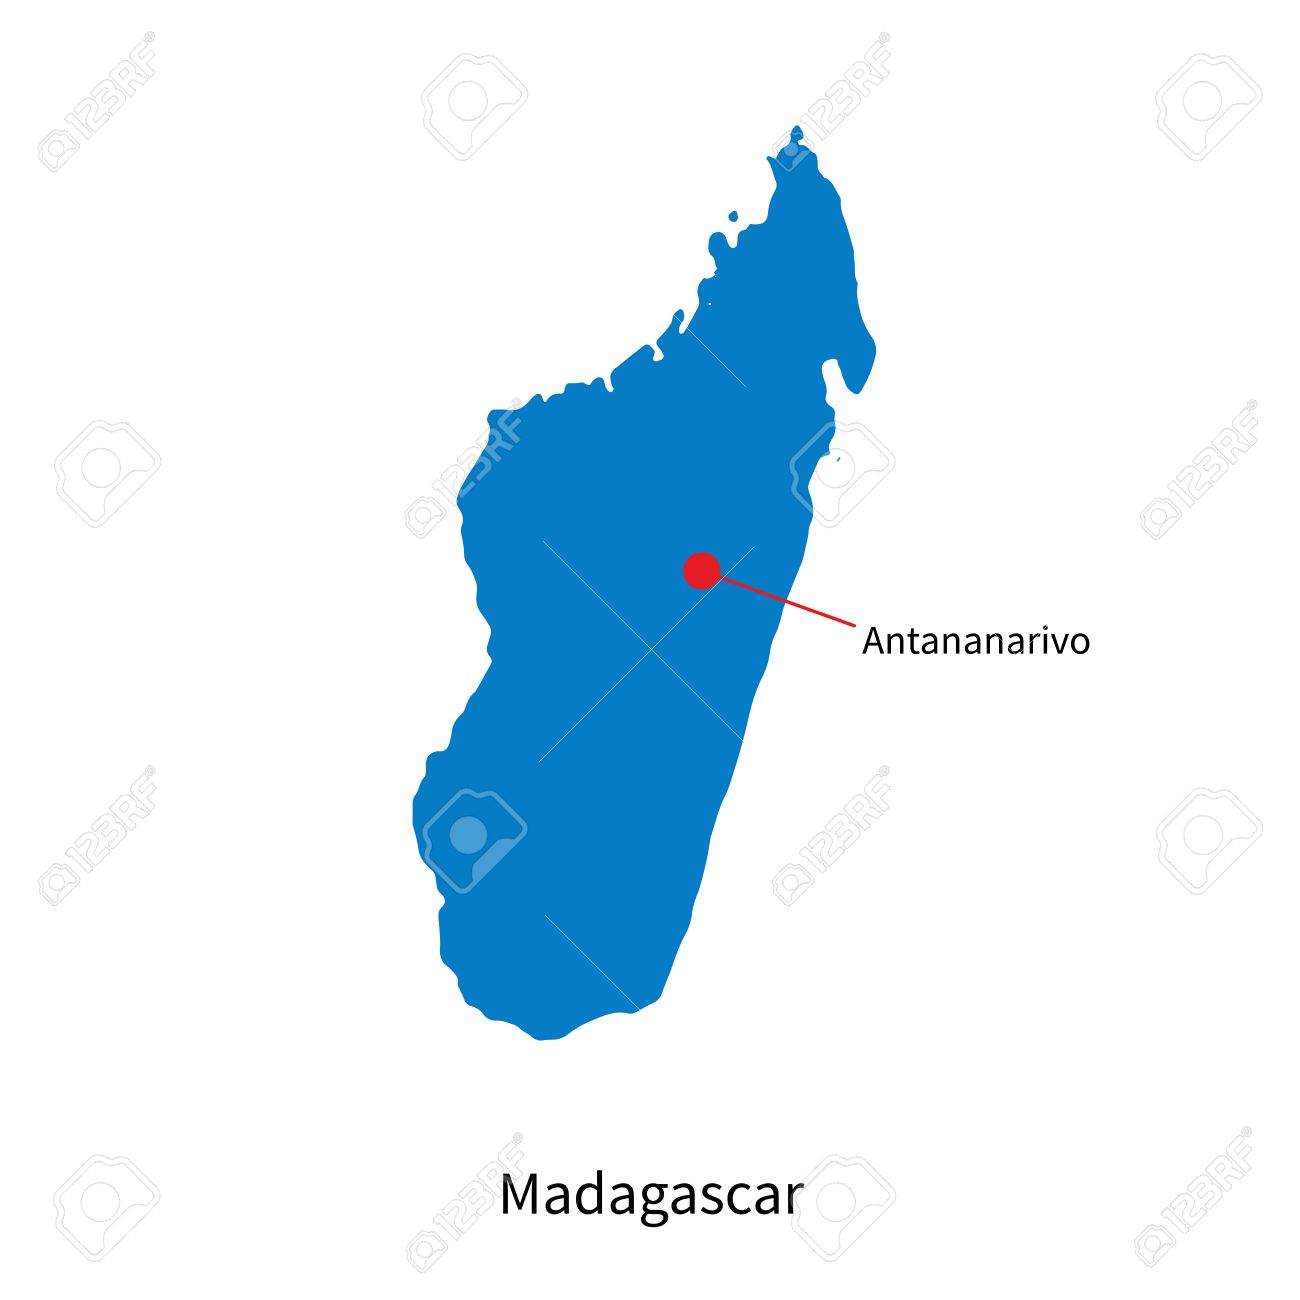 Antananarivo Madagascar Carte.Carte Detaillee De Madagascar Et La Capitale Antananarivo